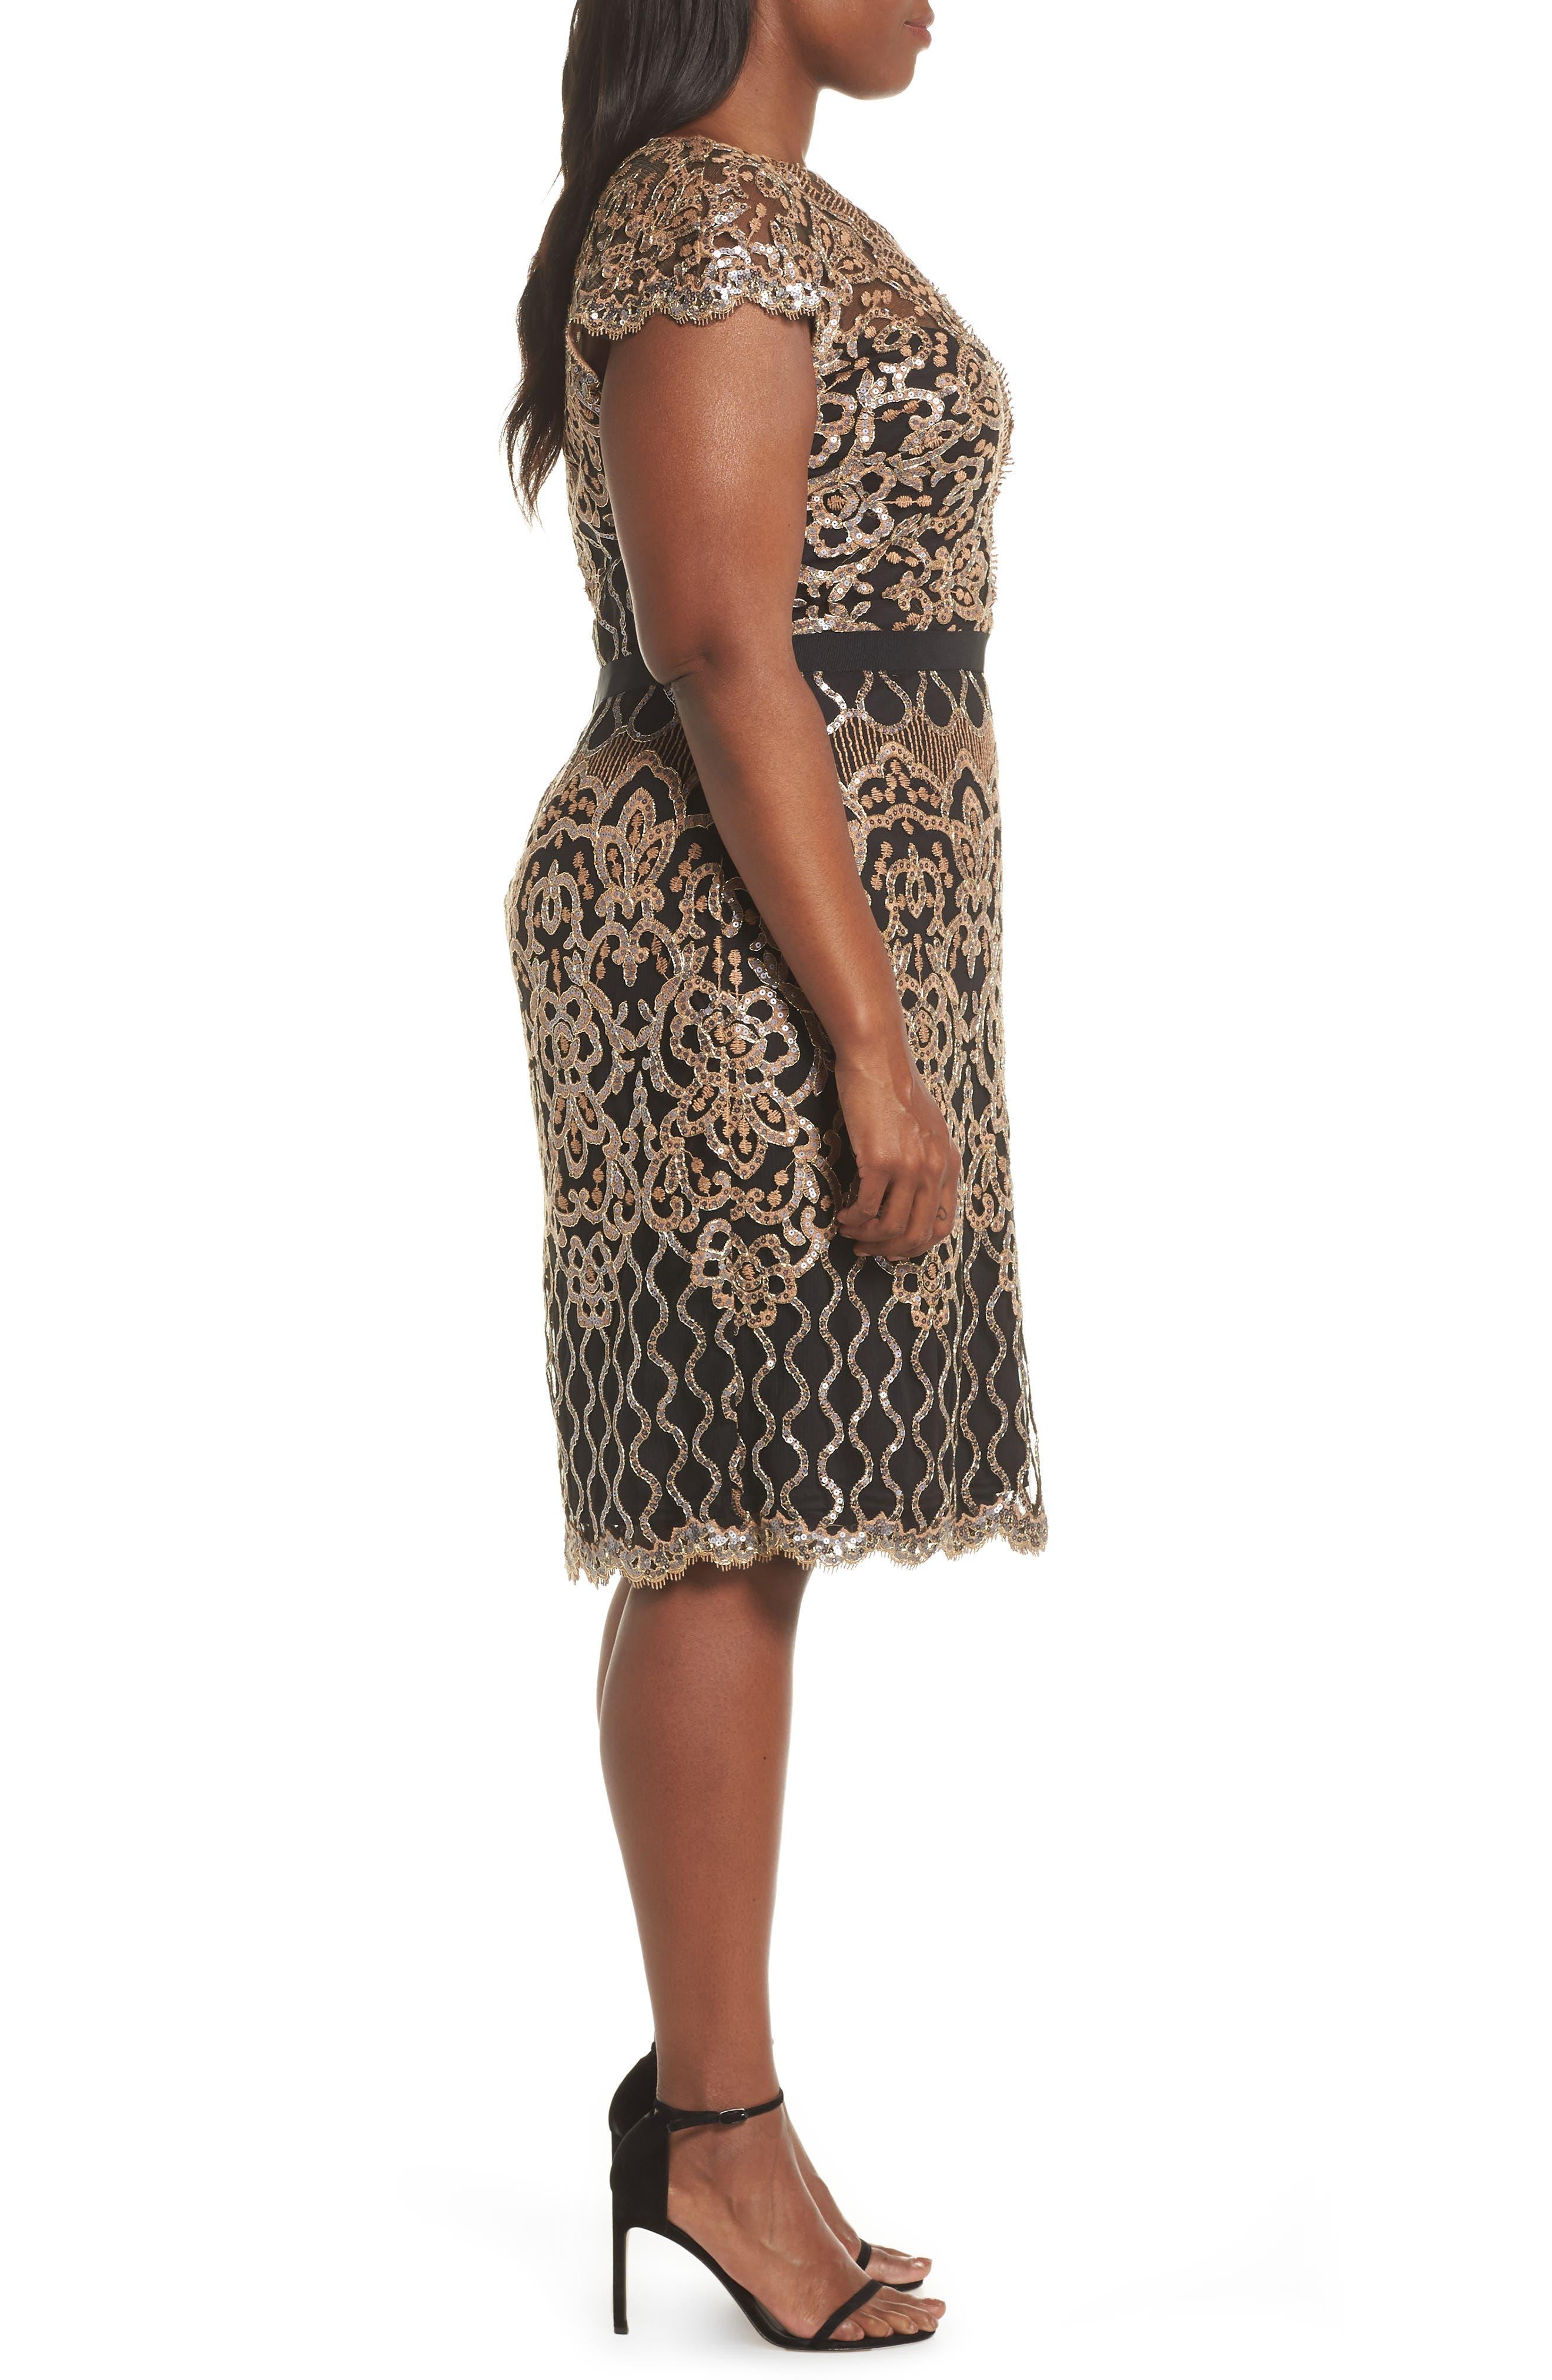 Sequin Embellished Dress,                             Alternate thumbnail 10, color,                             COPPER SHADOW/ BLACK